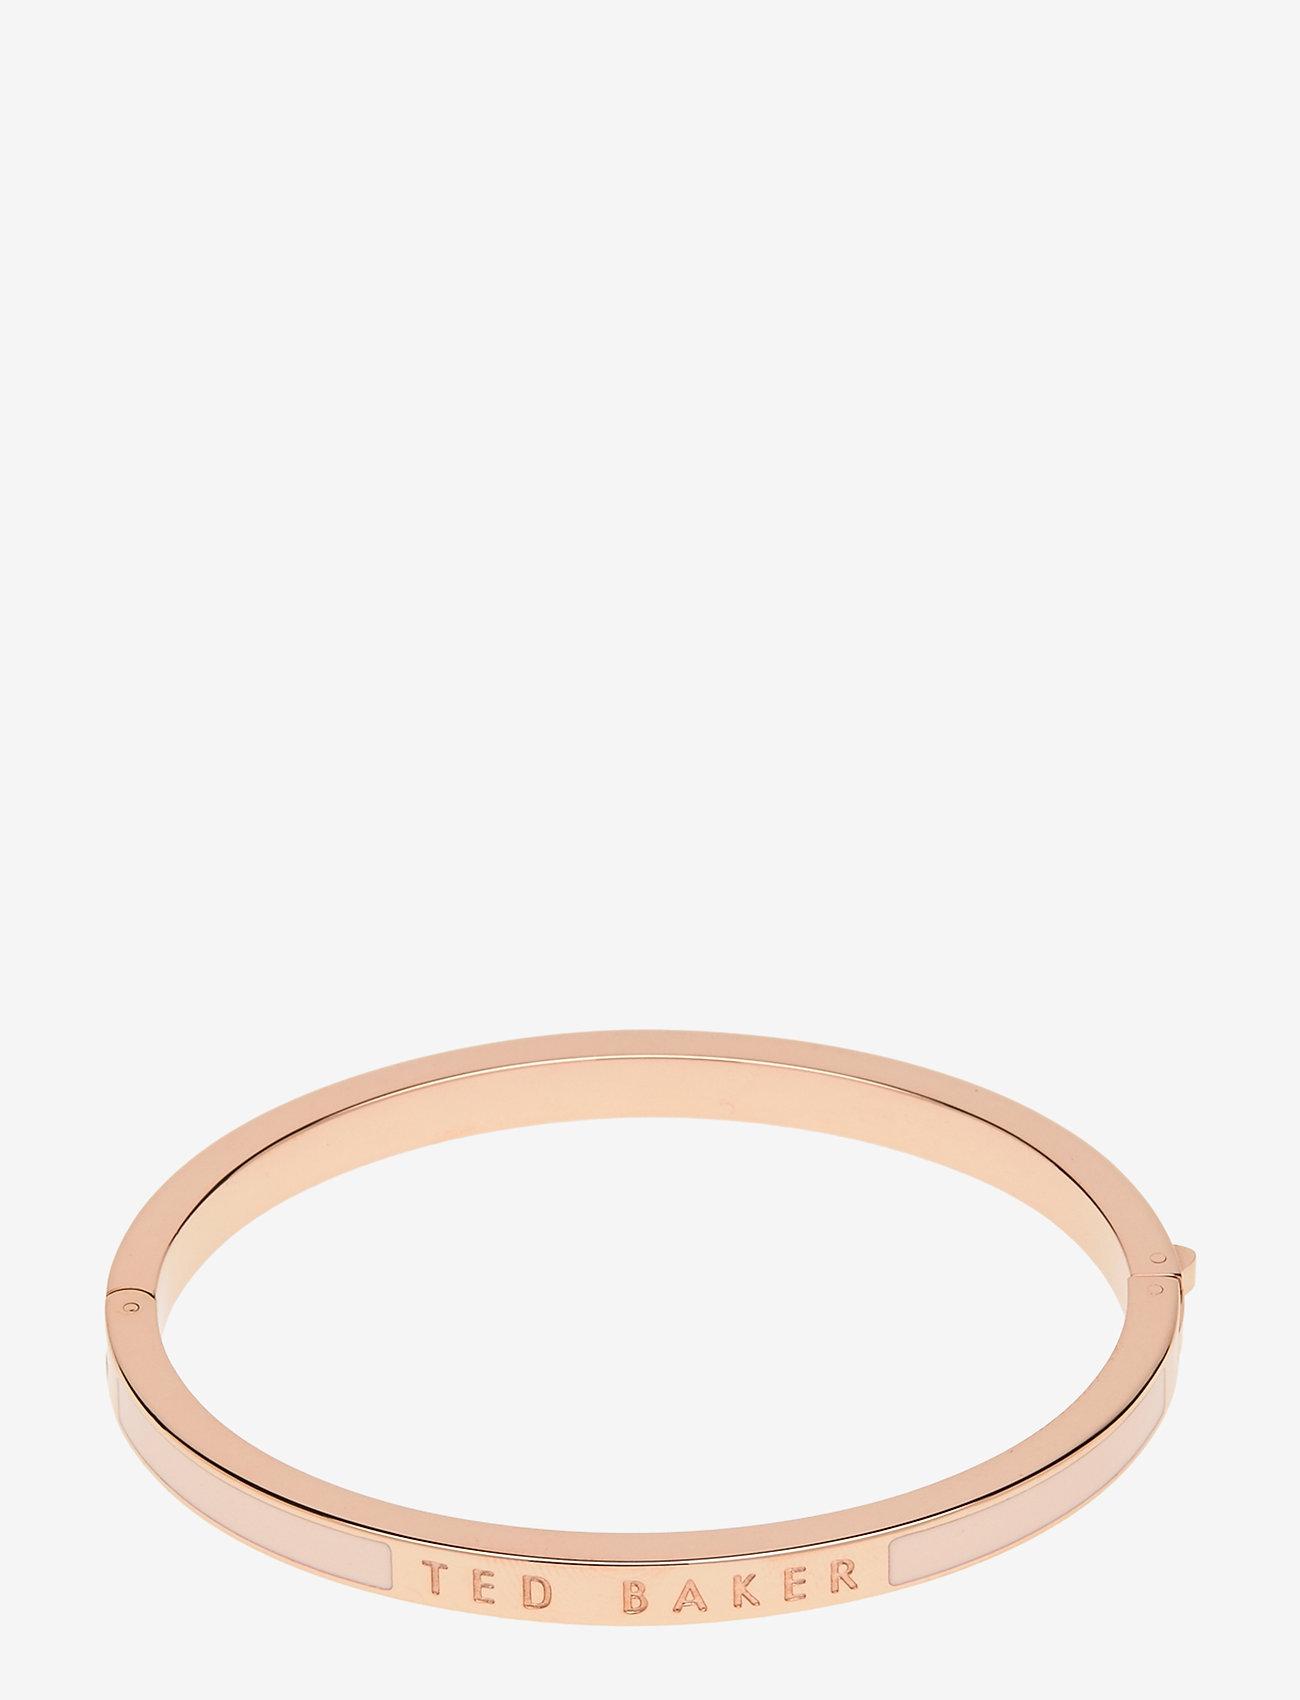 Ted Baker - ELEMARA - bangles - rose gold/baby pink - 0